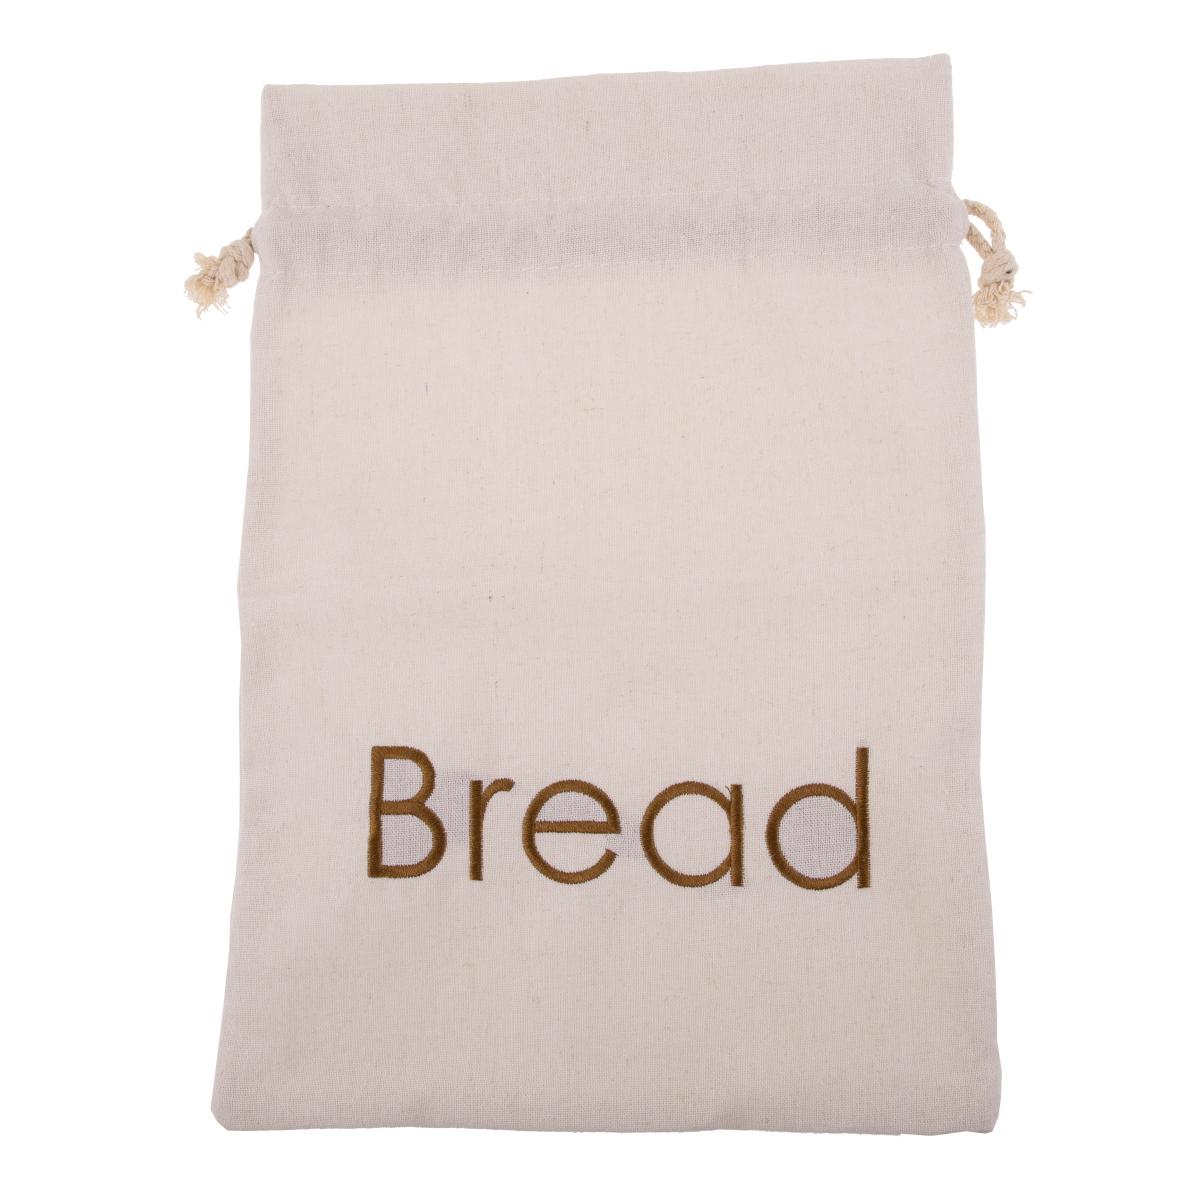 3658-1 bread bag storage